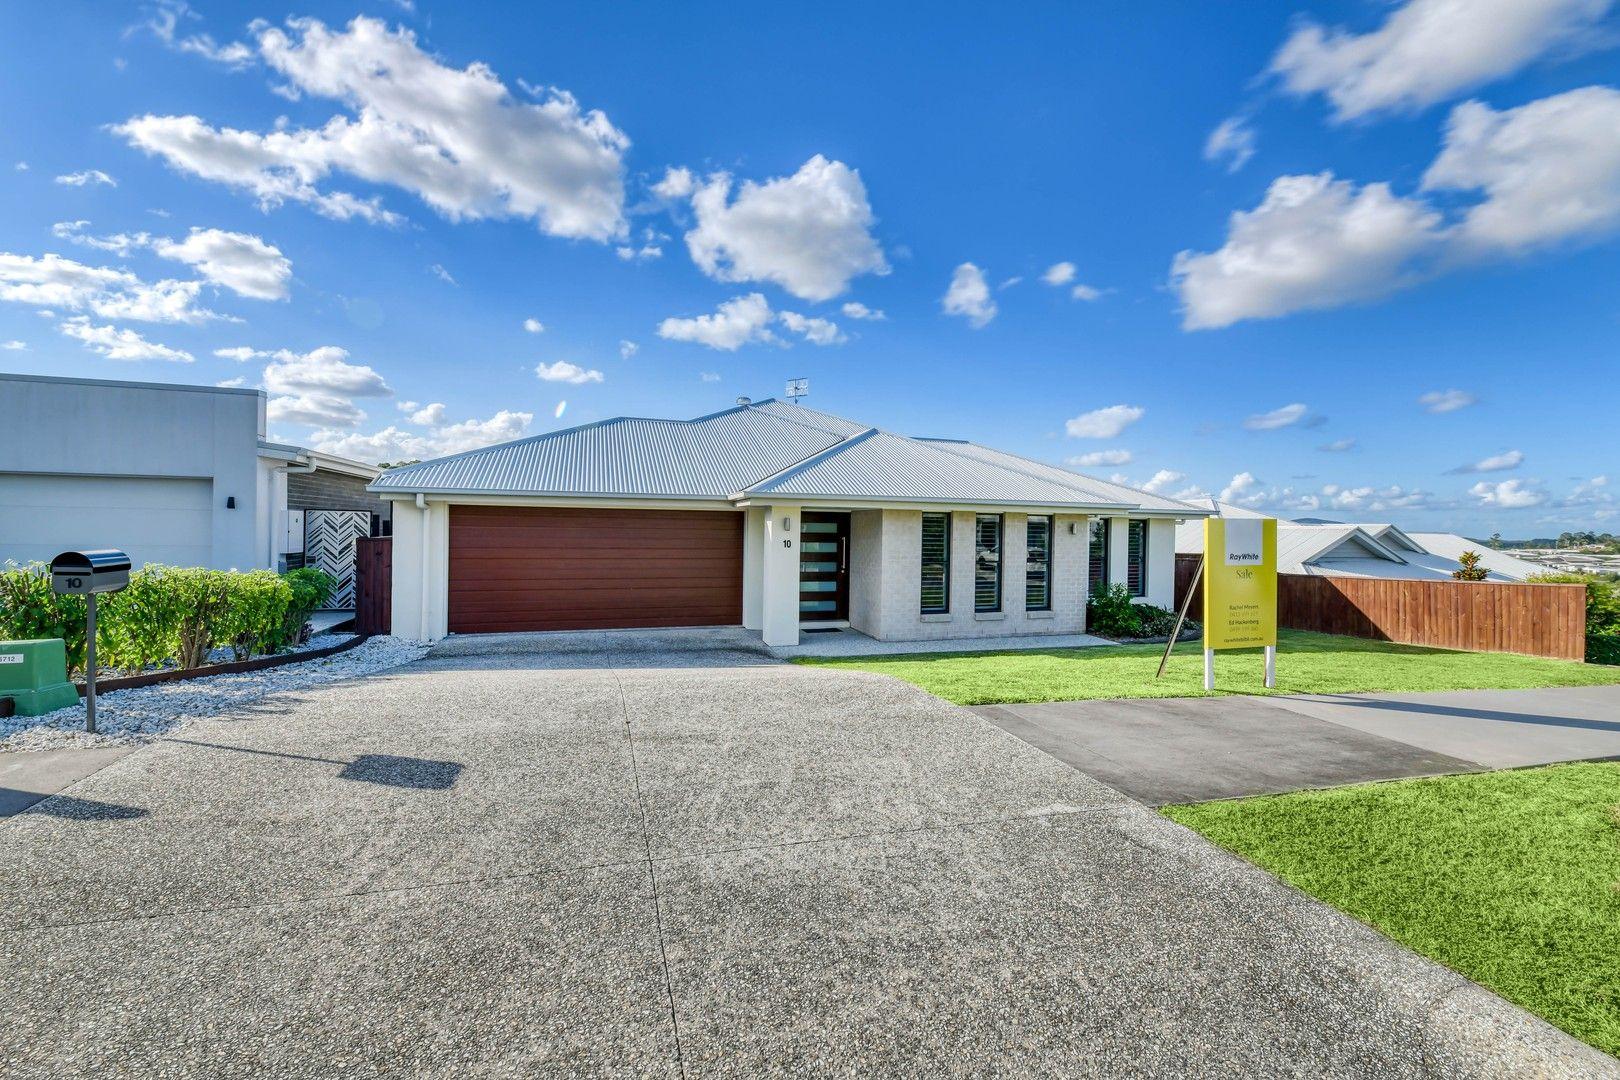 10 Butcherbird Crescent, Bli Bli QLD 4560, Image 0